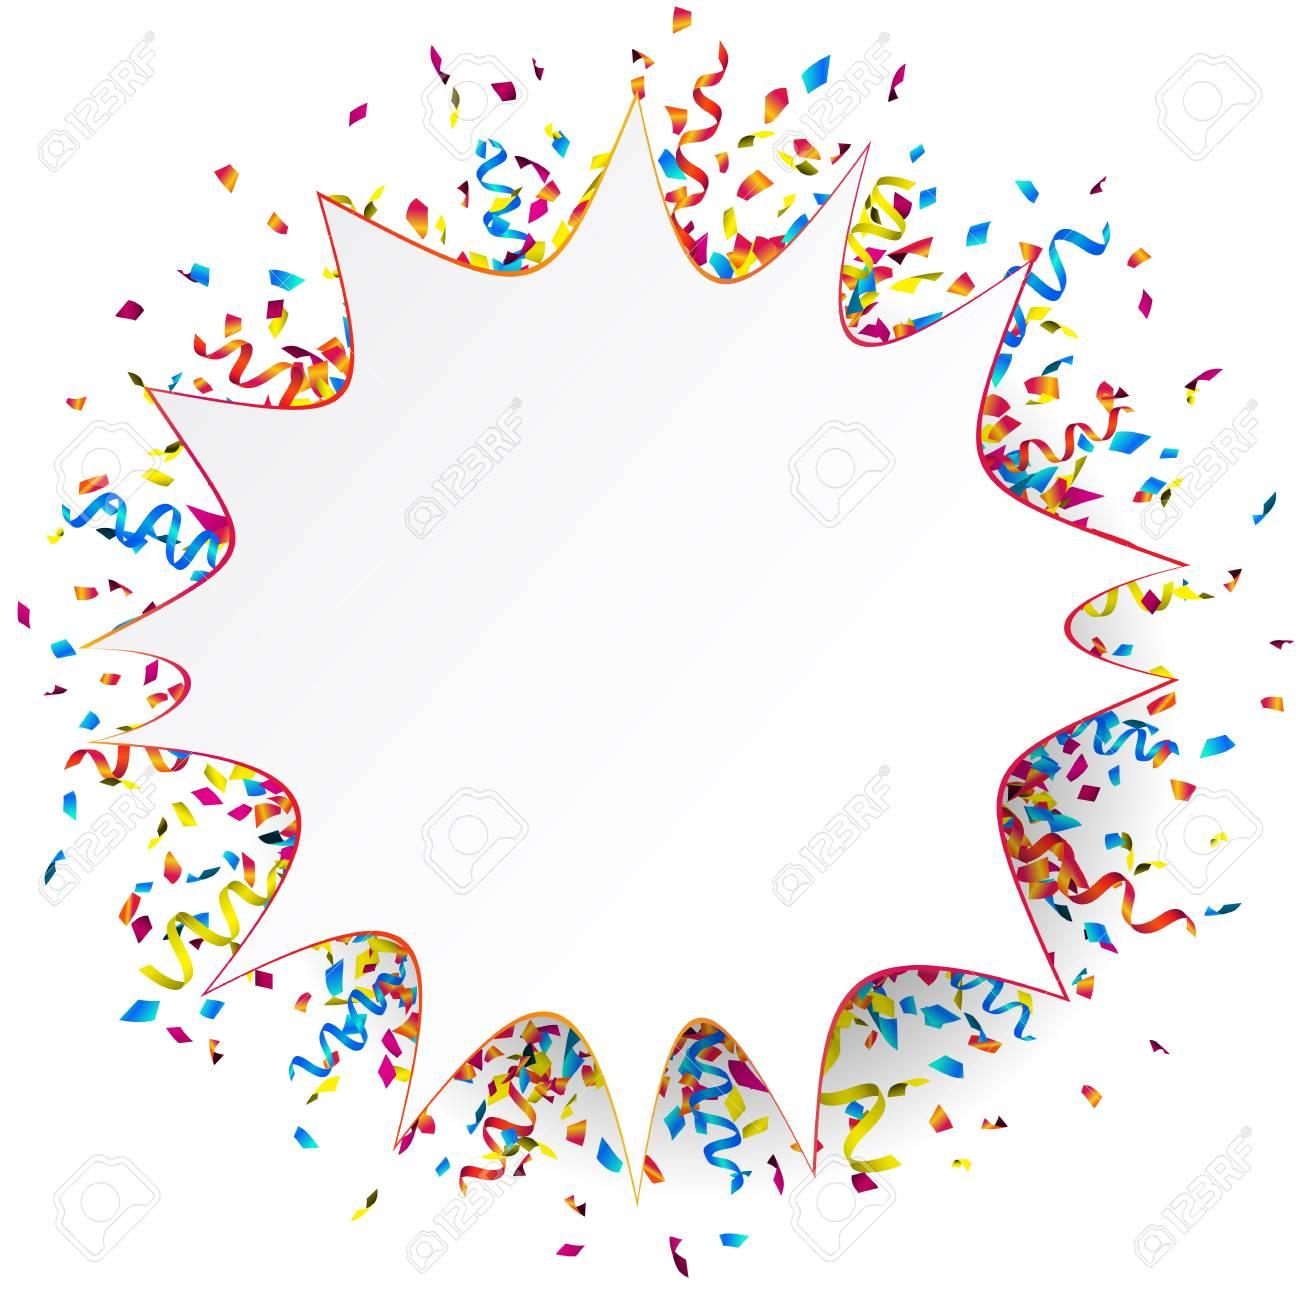 white funny paper banner with colorful ribbons and confetti rh 123rf com confetti vector freepik confetti vector png